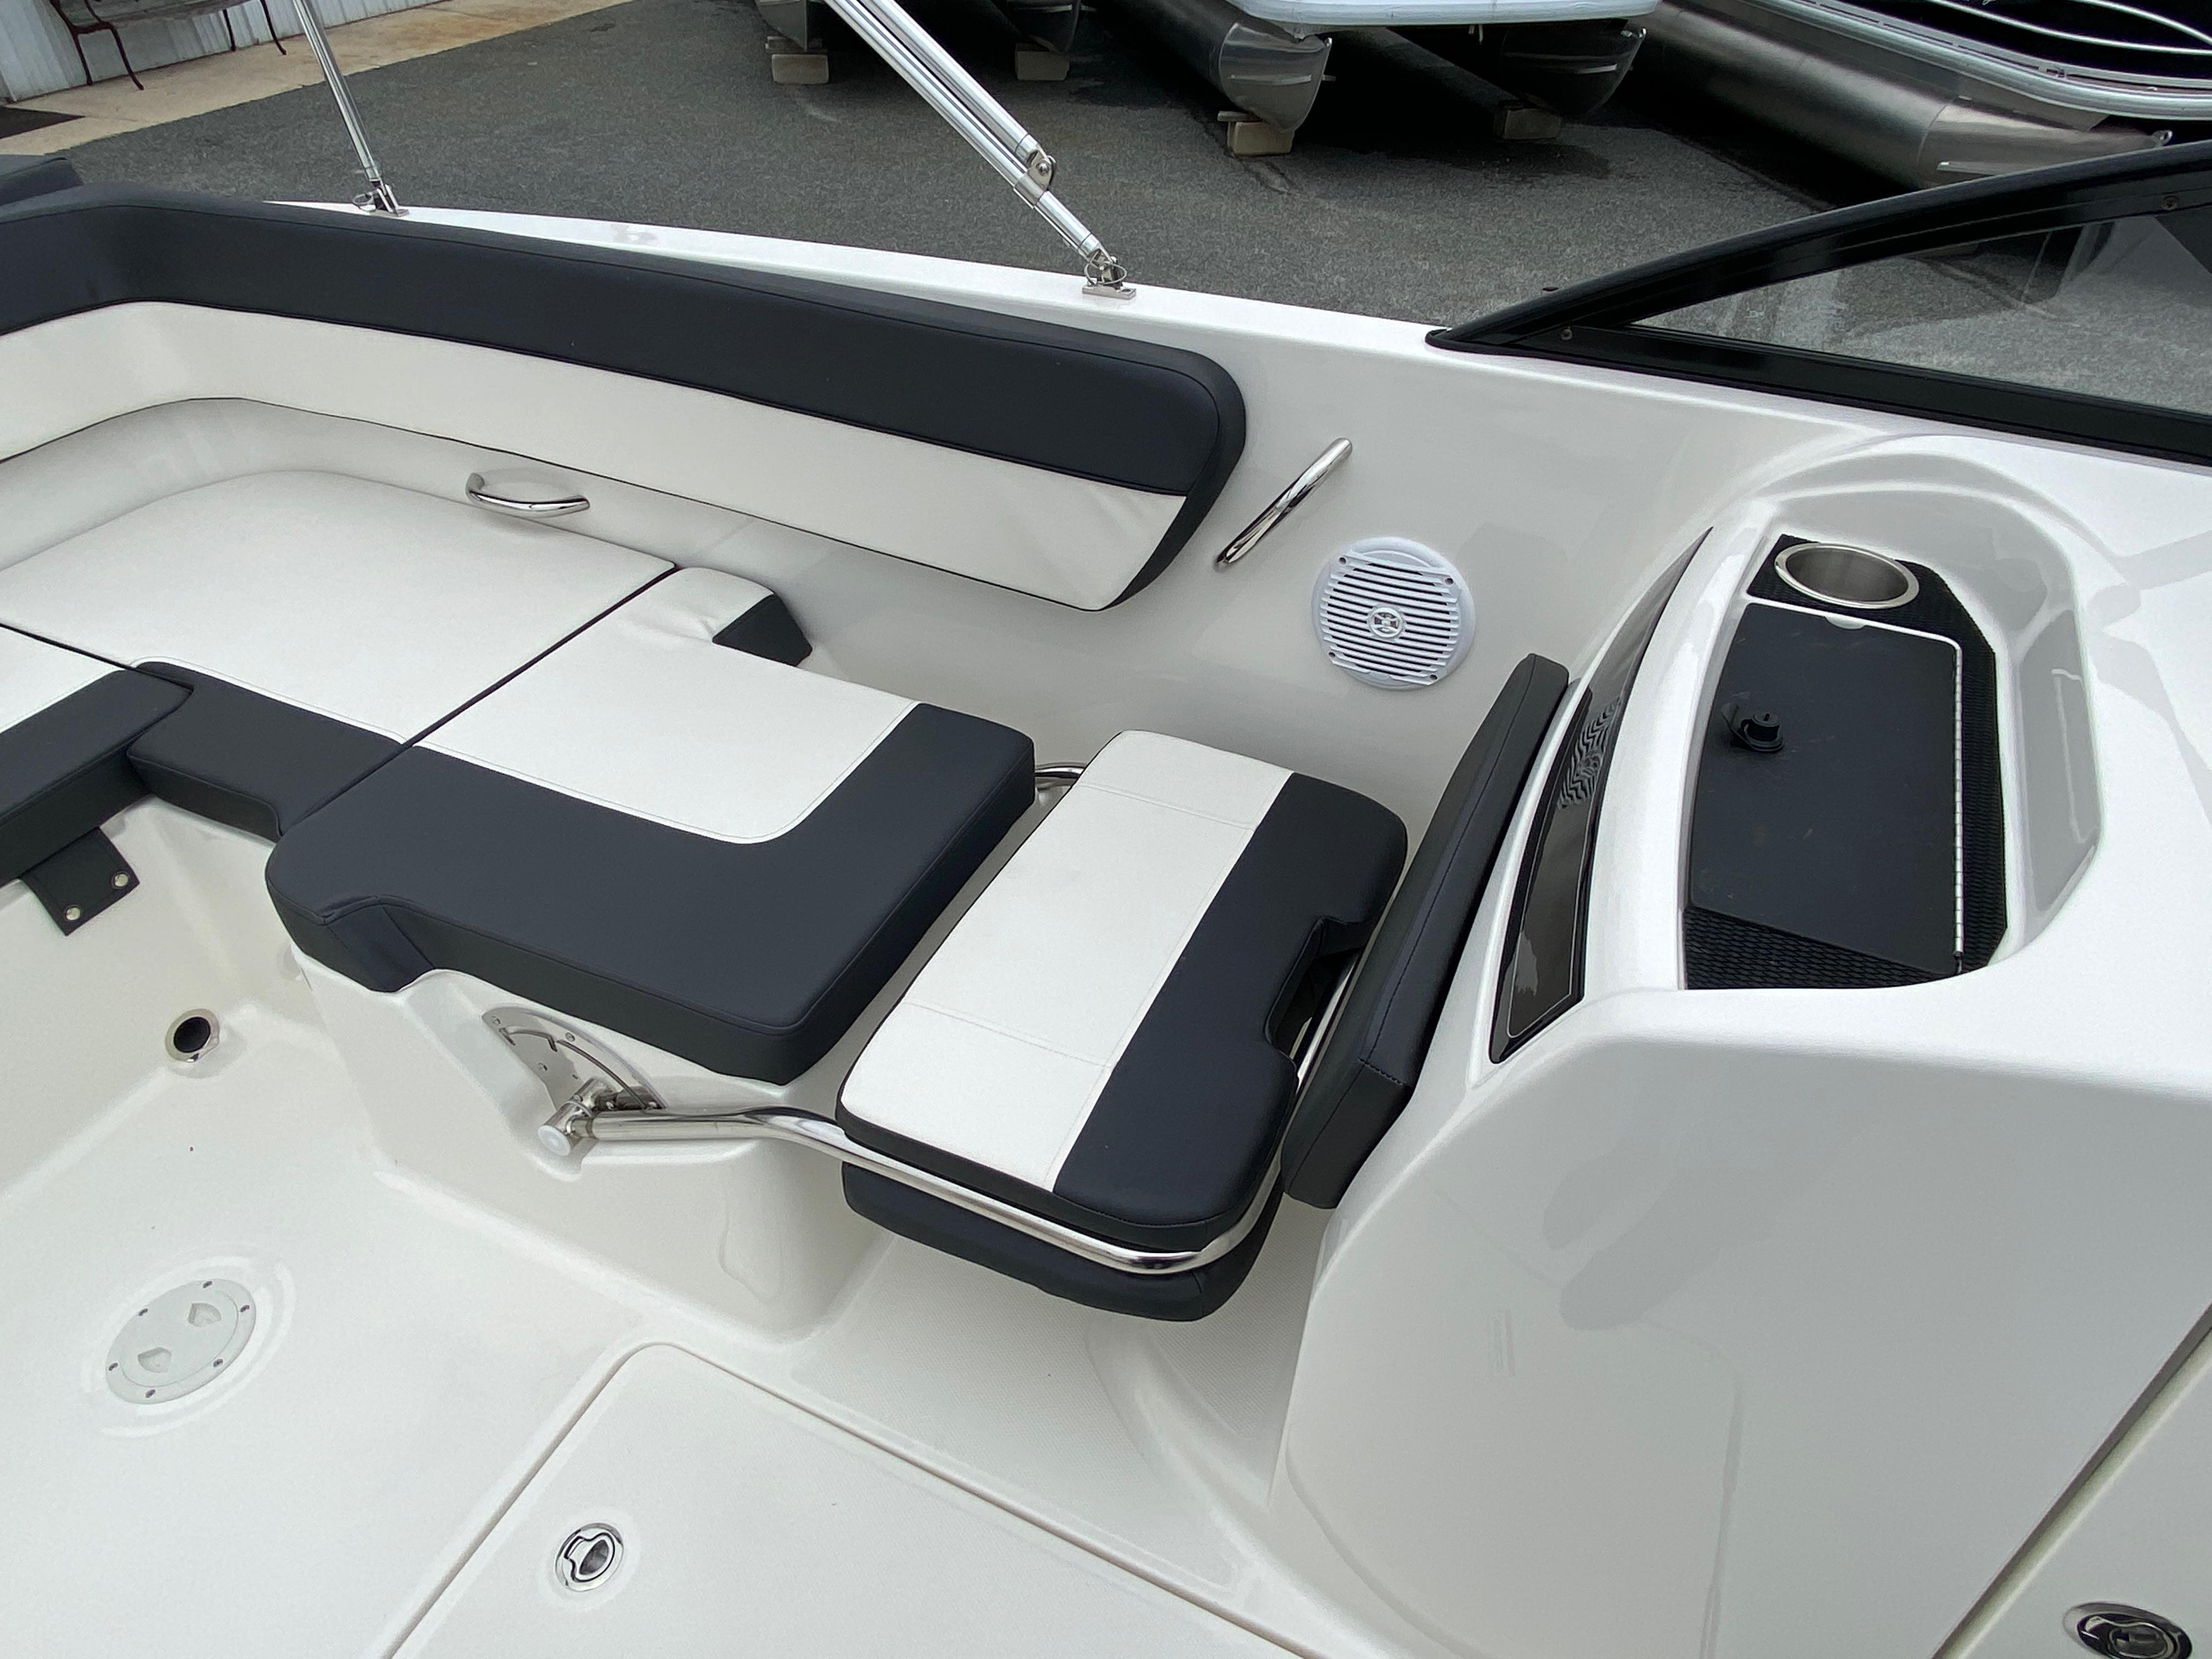 2020 Bayliner boat for sale, model of the boat is VR6 Bowrider & Image # 3 of 14